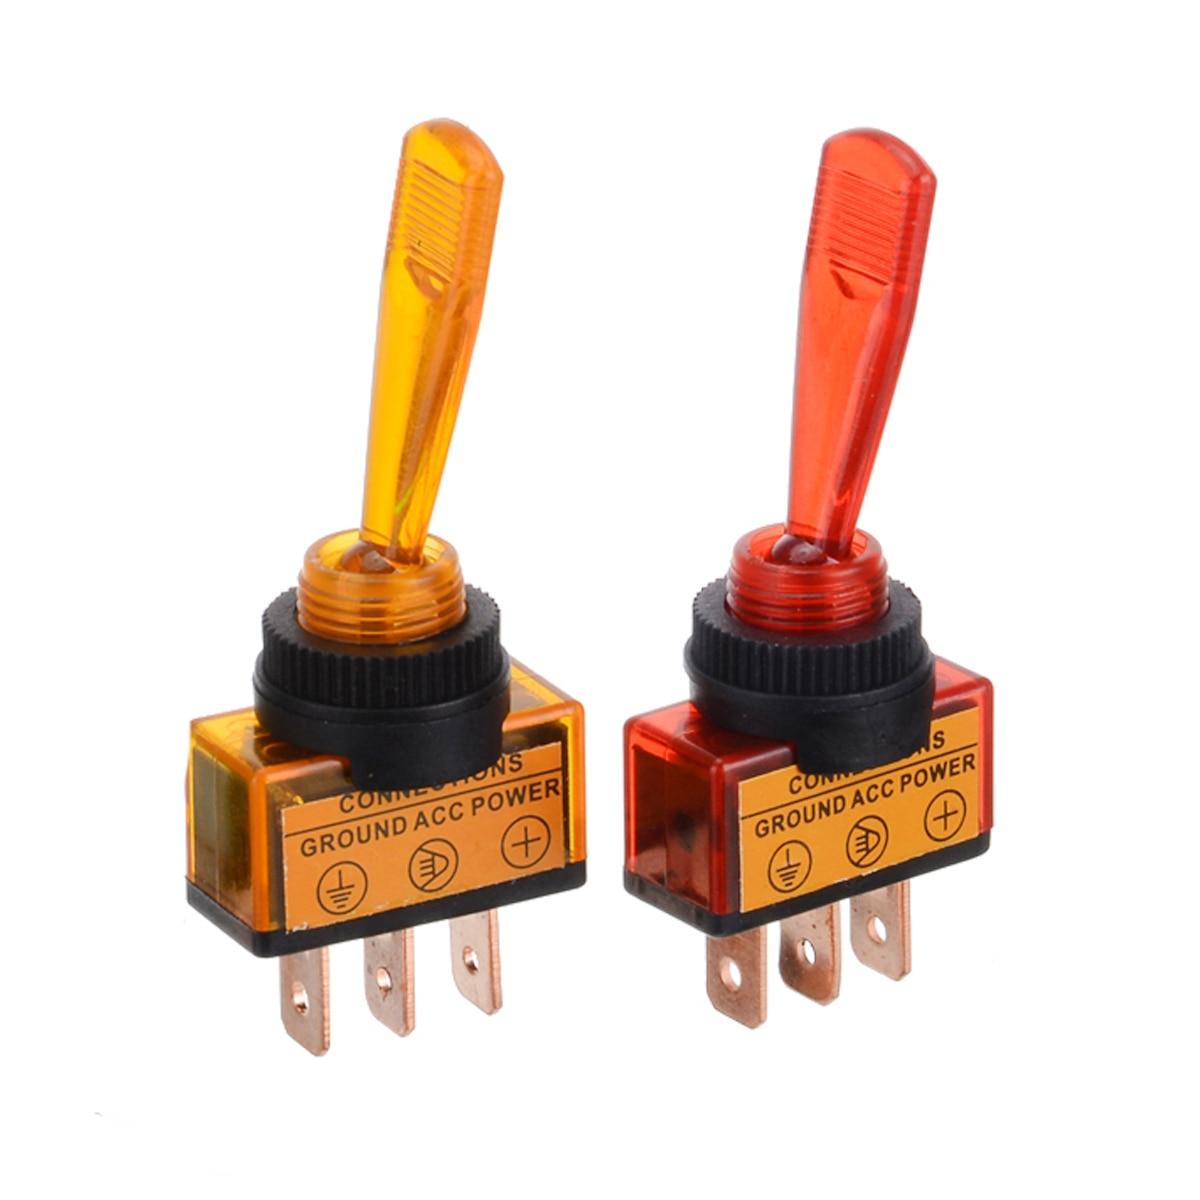 Hot Sale 4Pcs/set Rocker Switch Toggle Rocker Switch 3 Pin On/Off SPST DC 12V 20A Rocker Switches For Car Boat Truck